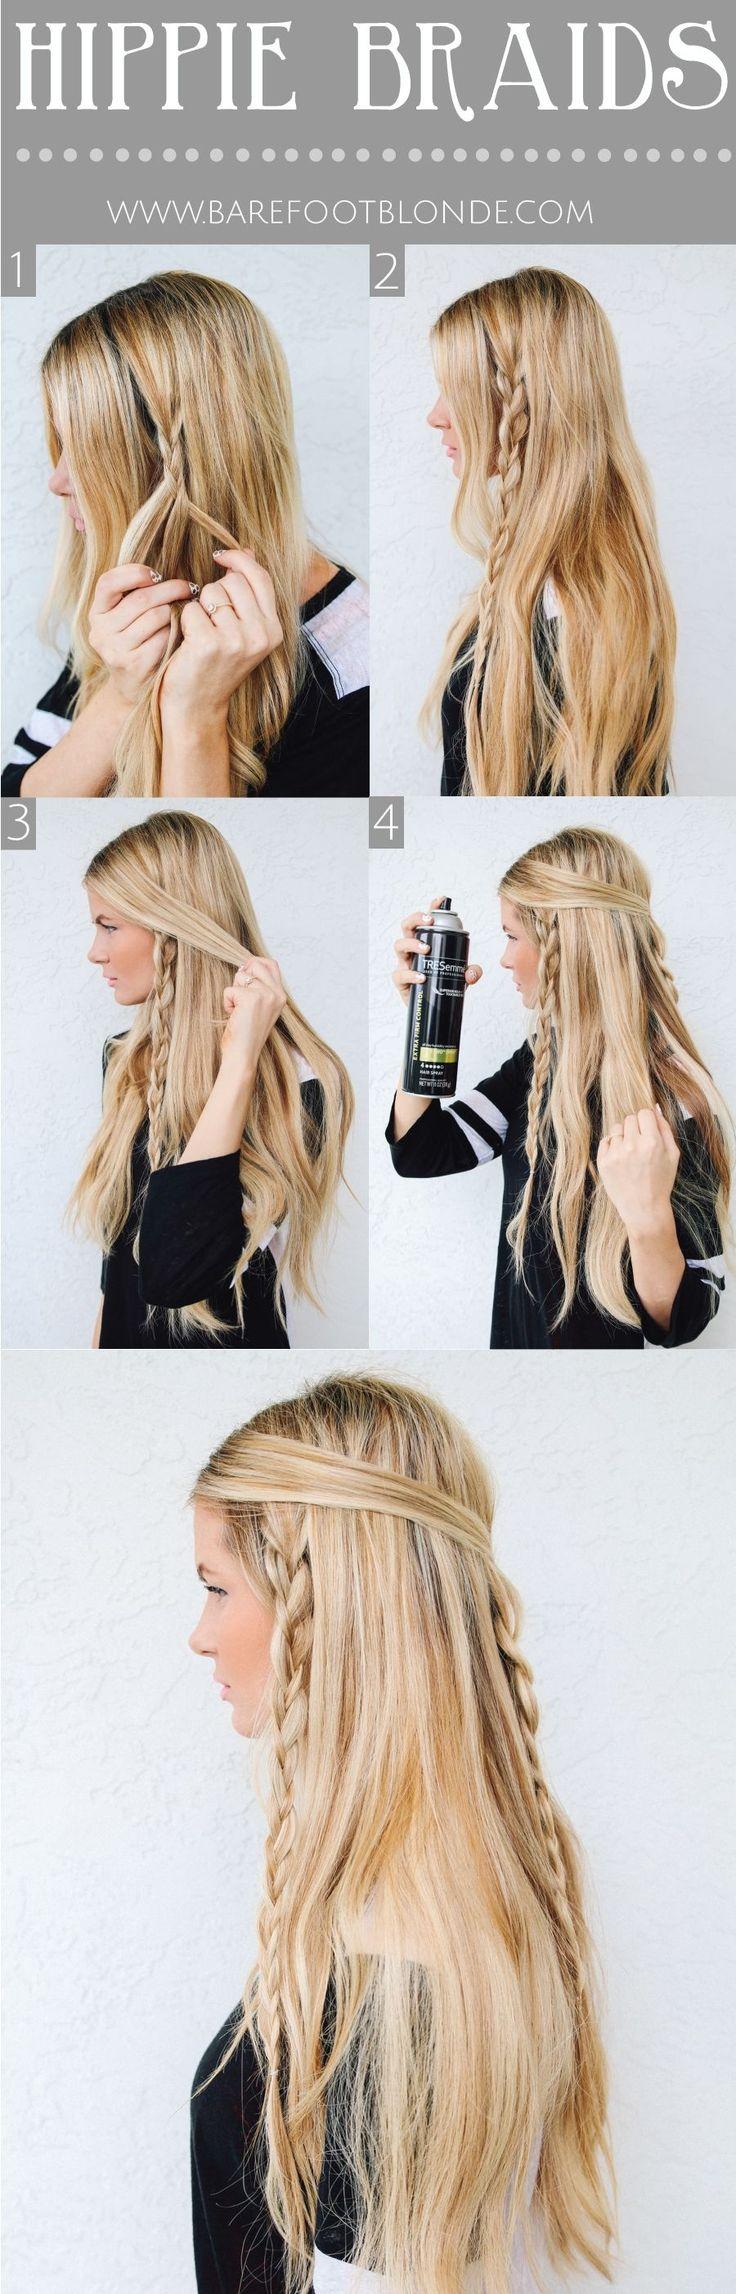 best 20+ bohemian hairstyles ideas on pinterest | hippie style